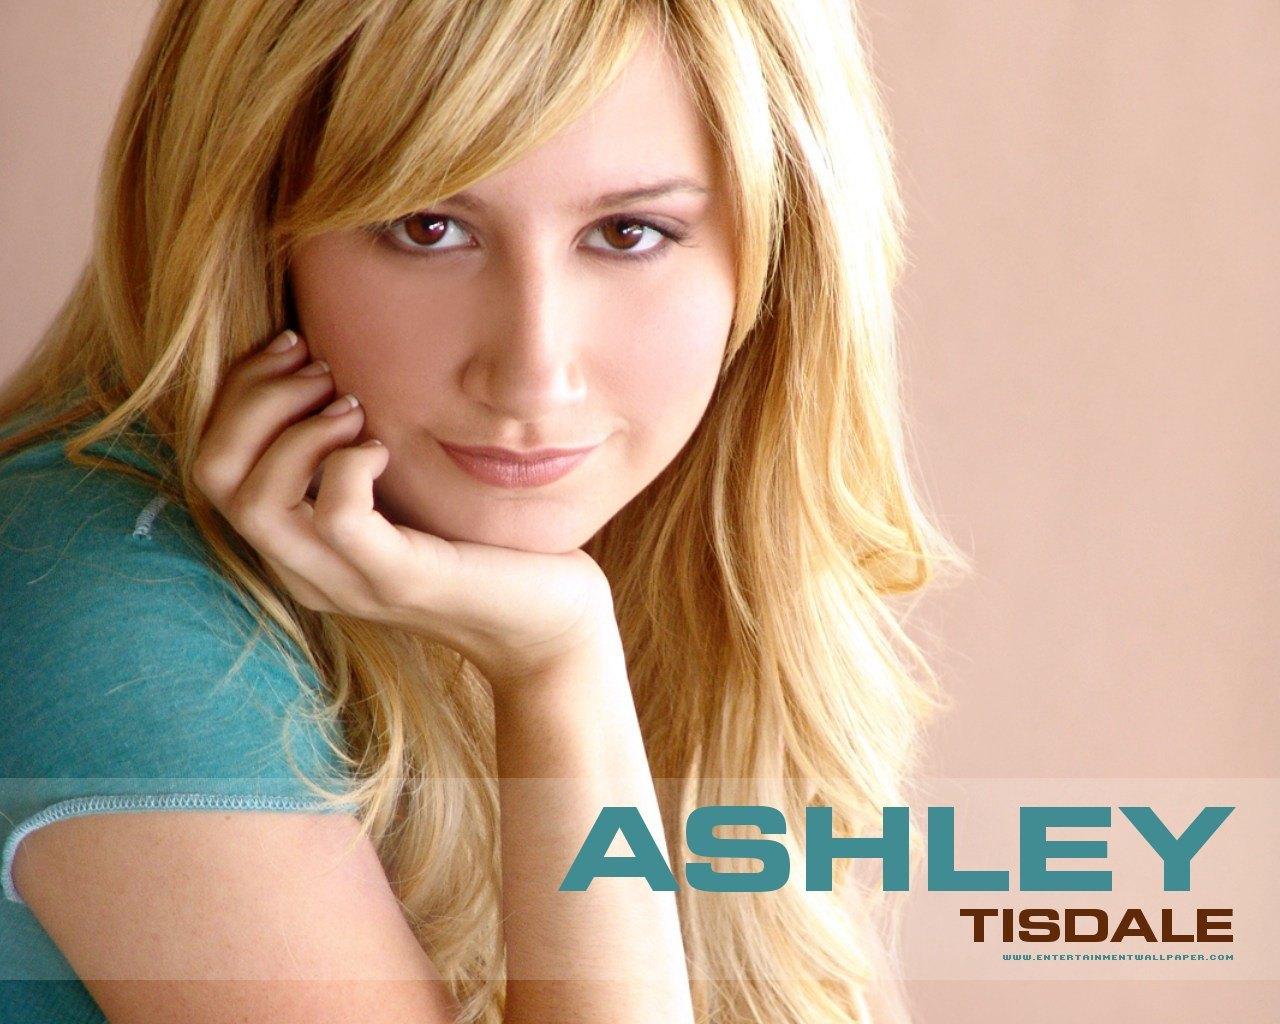 http://1.bp.blogspot.com/-50EE7oGXFxg/T5qwORRS_HI/AAAAAAAAATw/IyzlmvOIZ2M/s1600/Ashley+Tisdale+Wallpapers+3.jpg